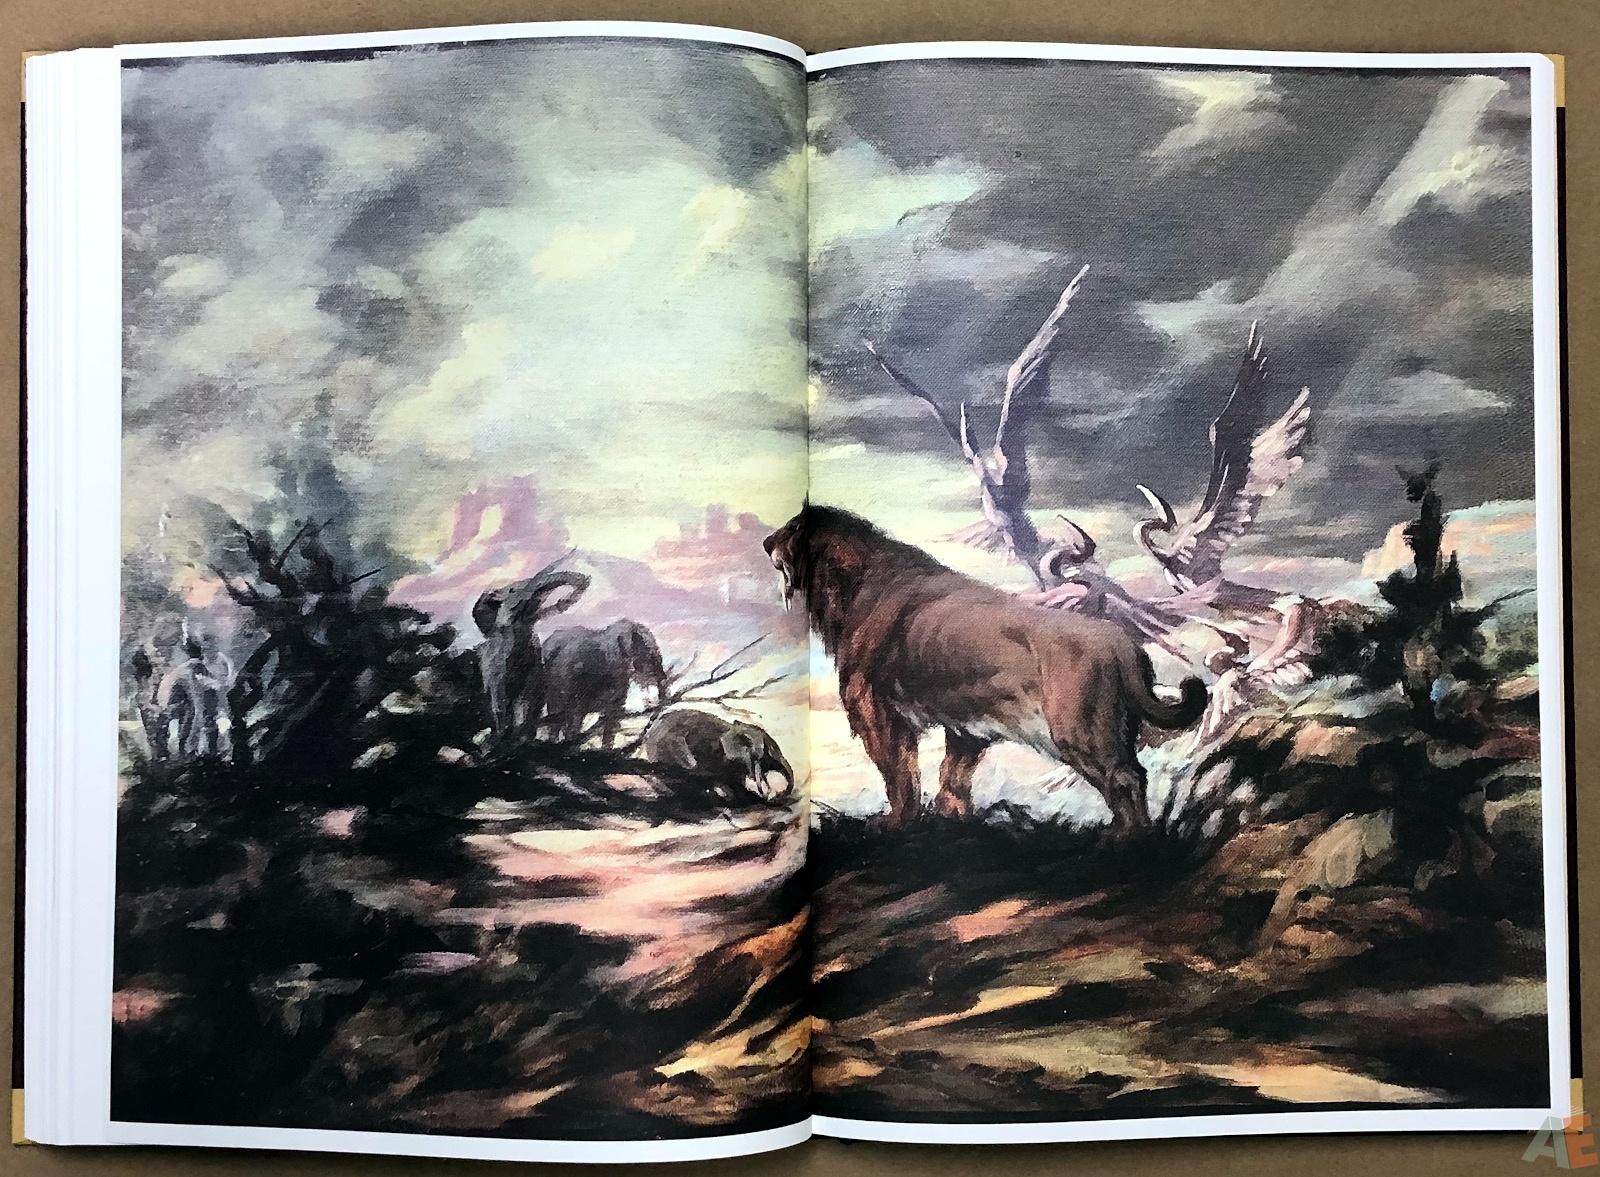 Roy G. Krenkel: Father of Heroic Fantasy - A Centennial Celebration 33